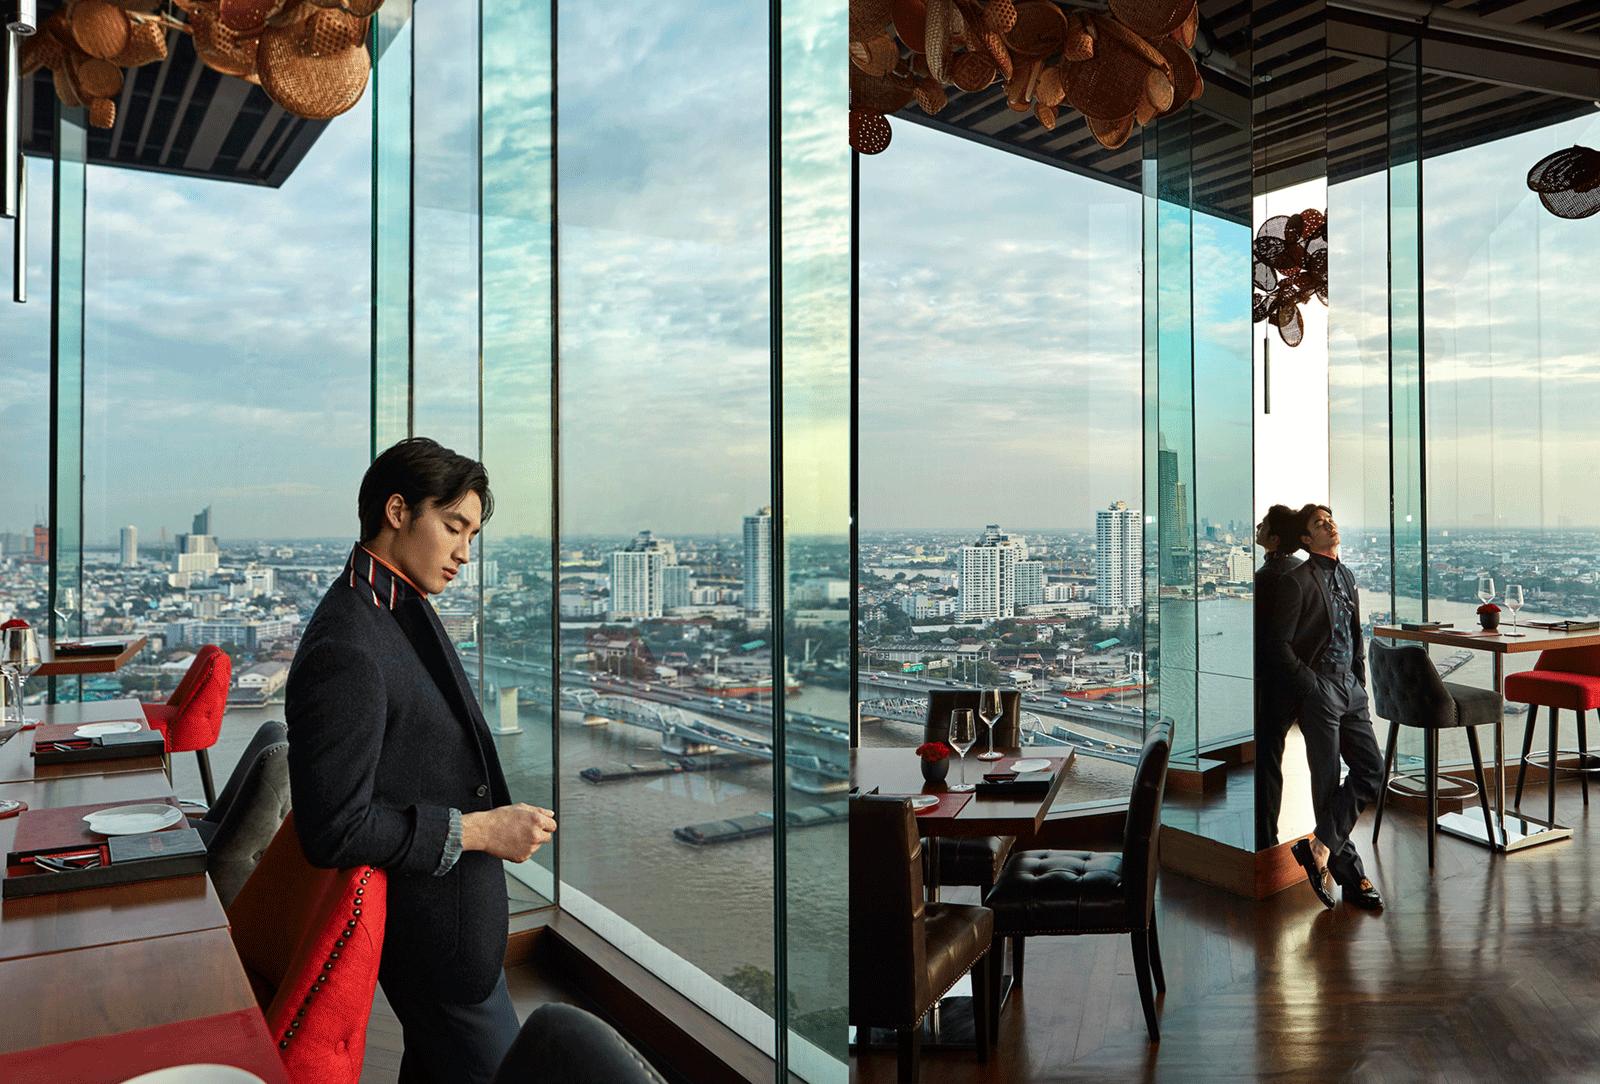 Avani Riverside Bangkok Hotel  Photo: Republicstudio_th  Model : Ratthapoom Khainark @peck_ratthapoom  Make Up and Hair : Chin Chintasurasa @gin_chintasurasa  Clothes : Singha Life @ singhalifethailand  Shoes : Christian Louboutin  Location : Avani Riverside Bangkok Hotel  257 Charoennakorn Road, Thon Buri, Bangkok 10600   Phone :02 431 9100   www.minorhotels.com/en/avani/riverside-bangkok